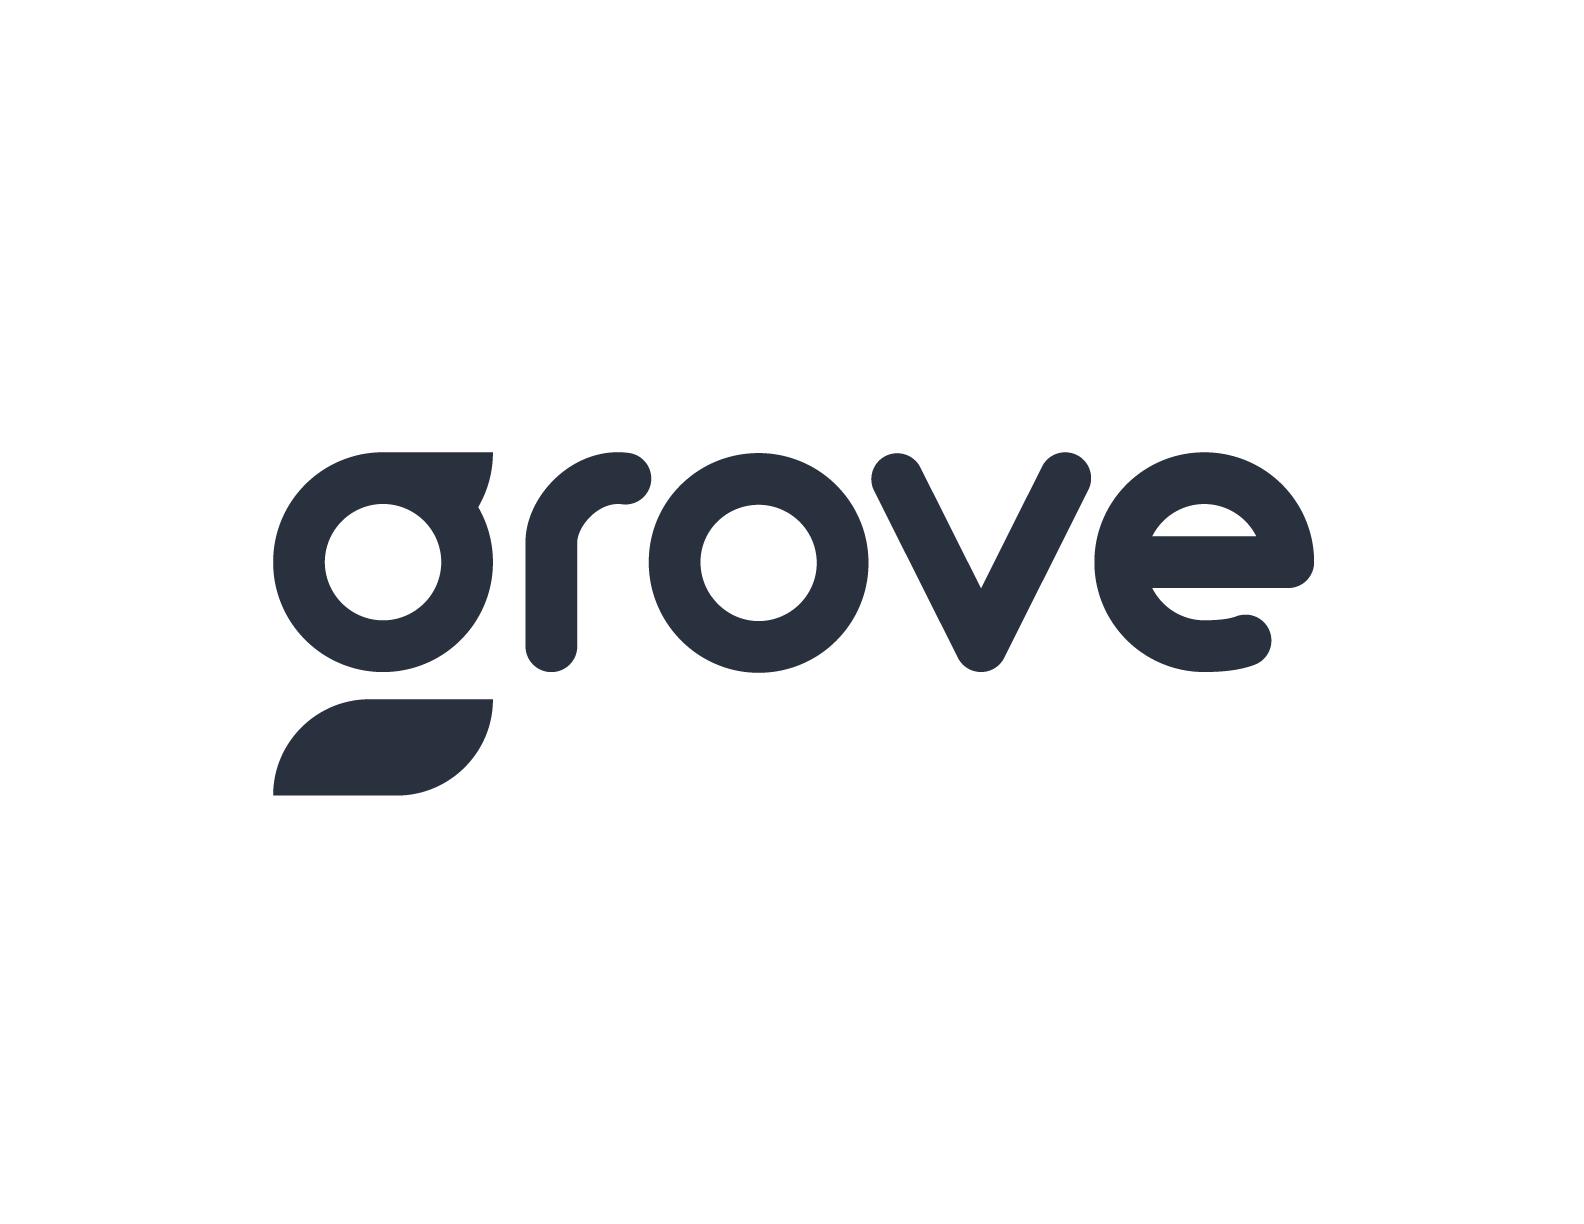 Grove-Wordmark